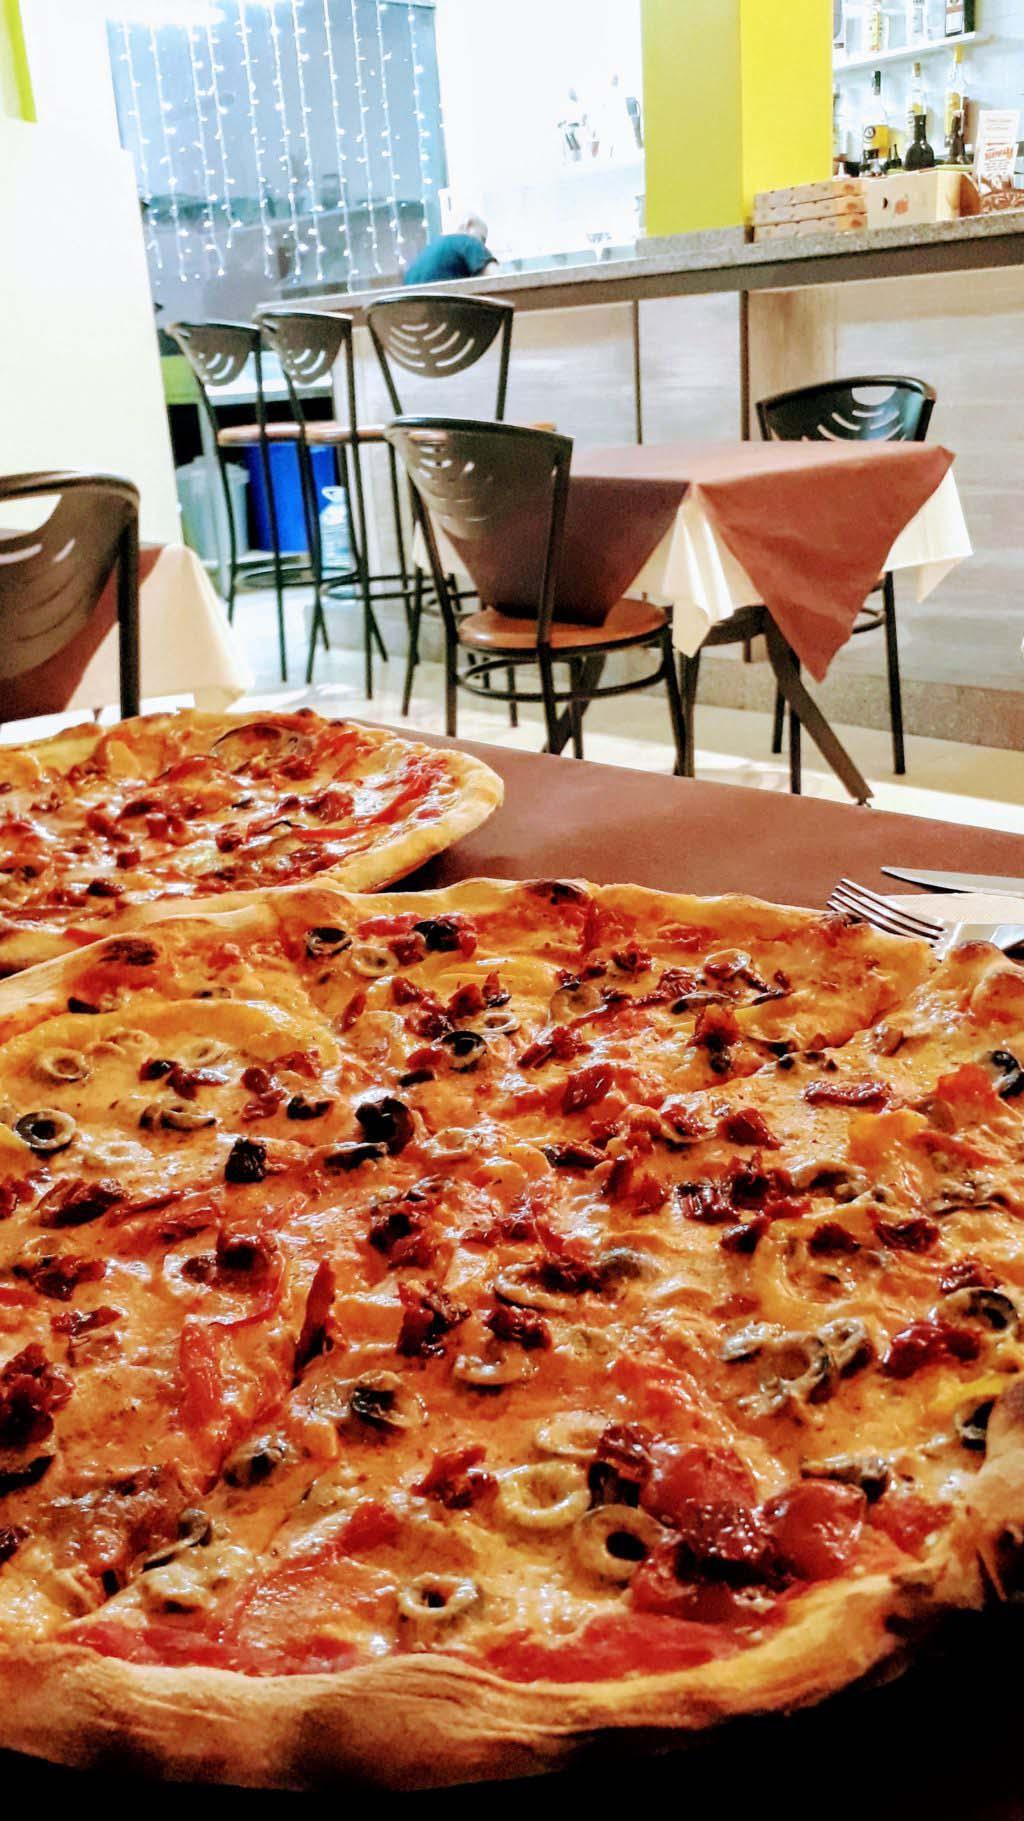 Pizzeria Focacceria Zeneize